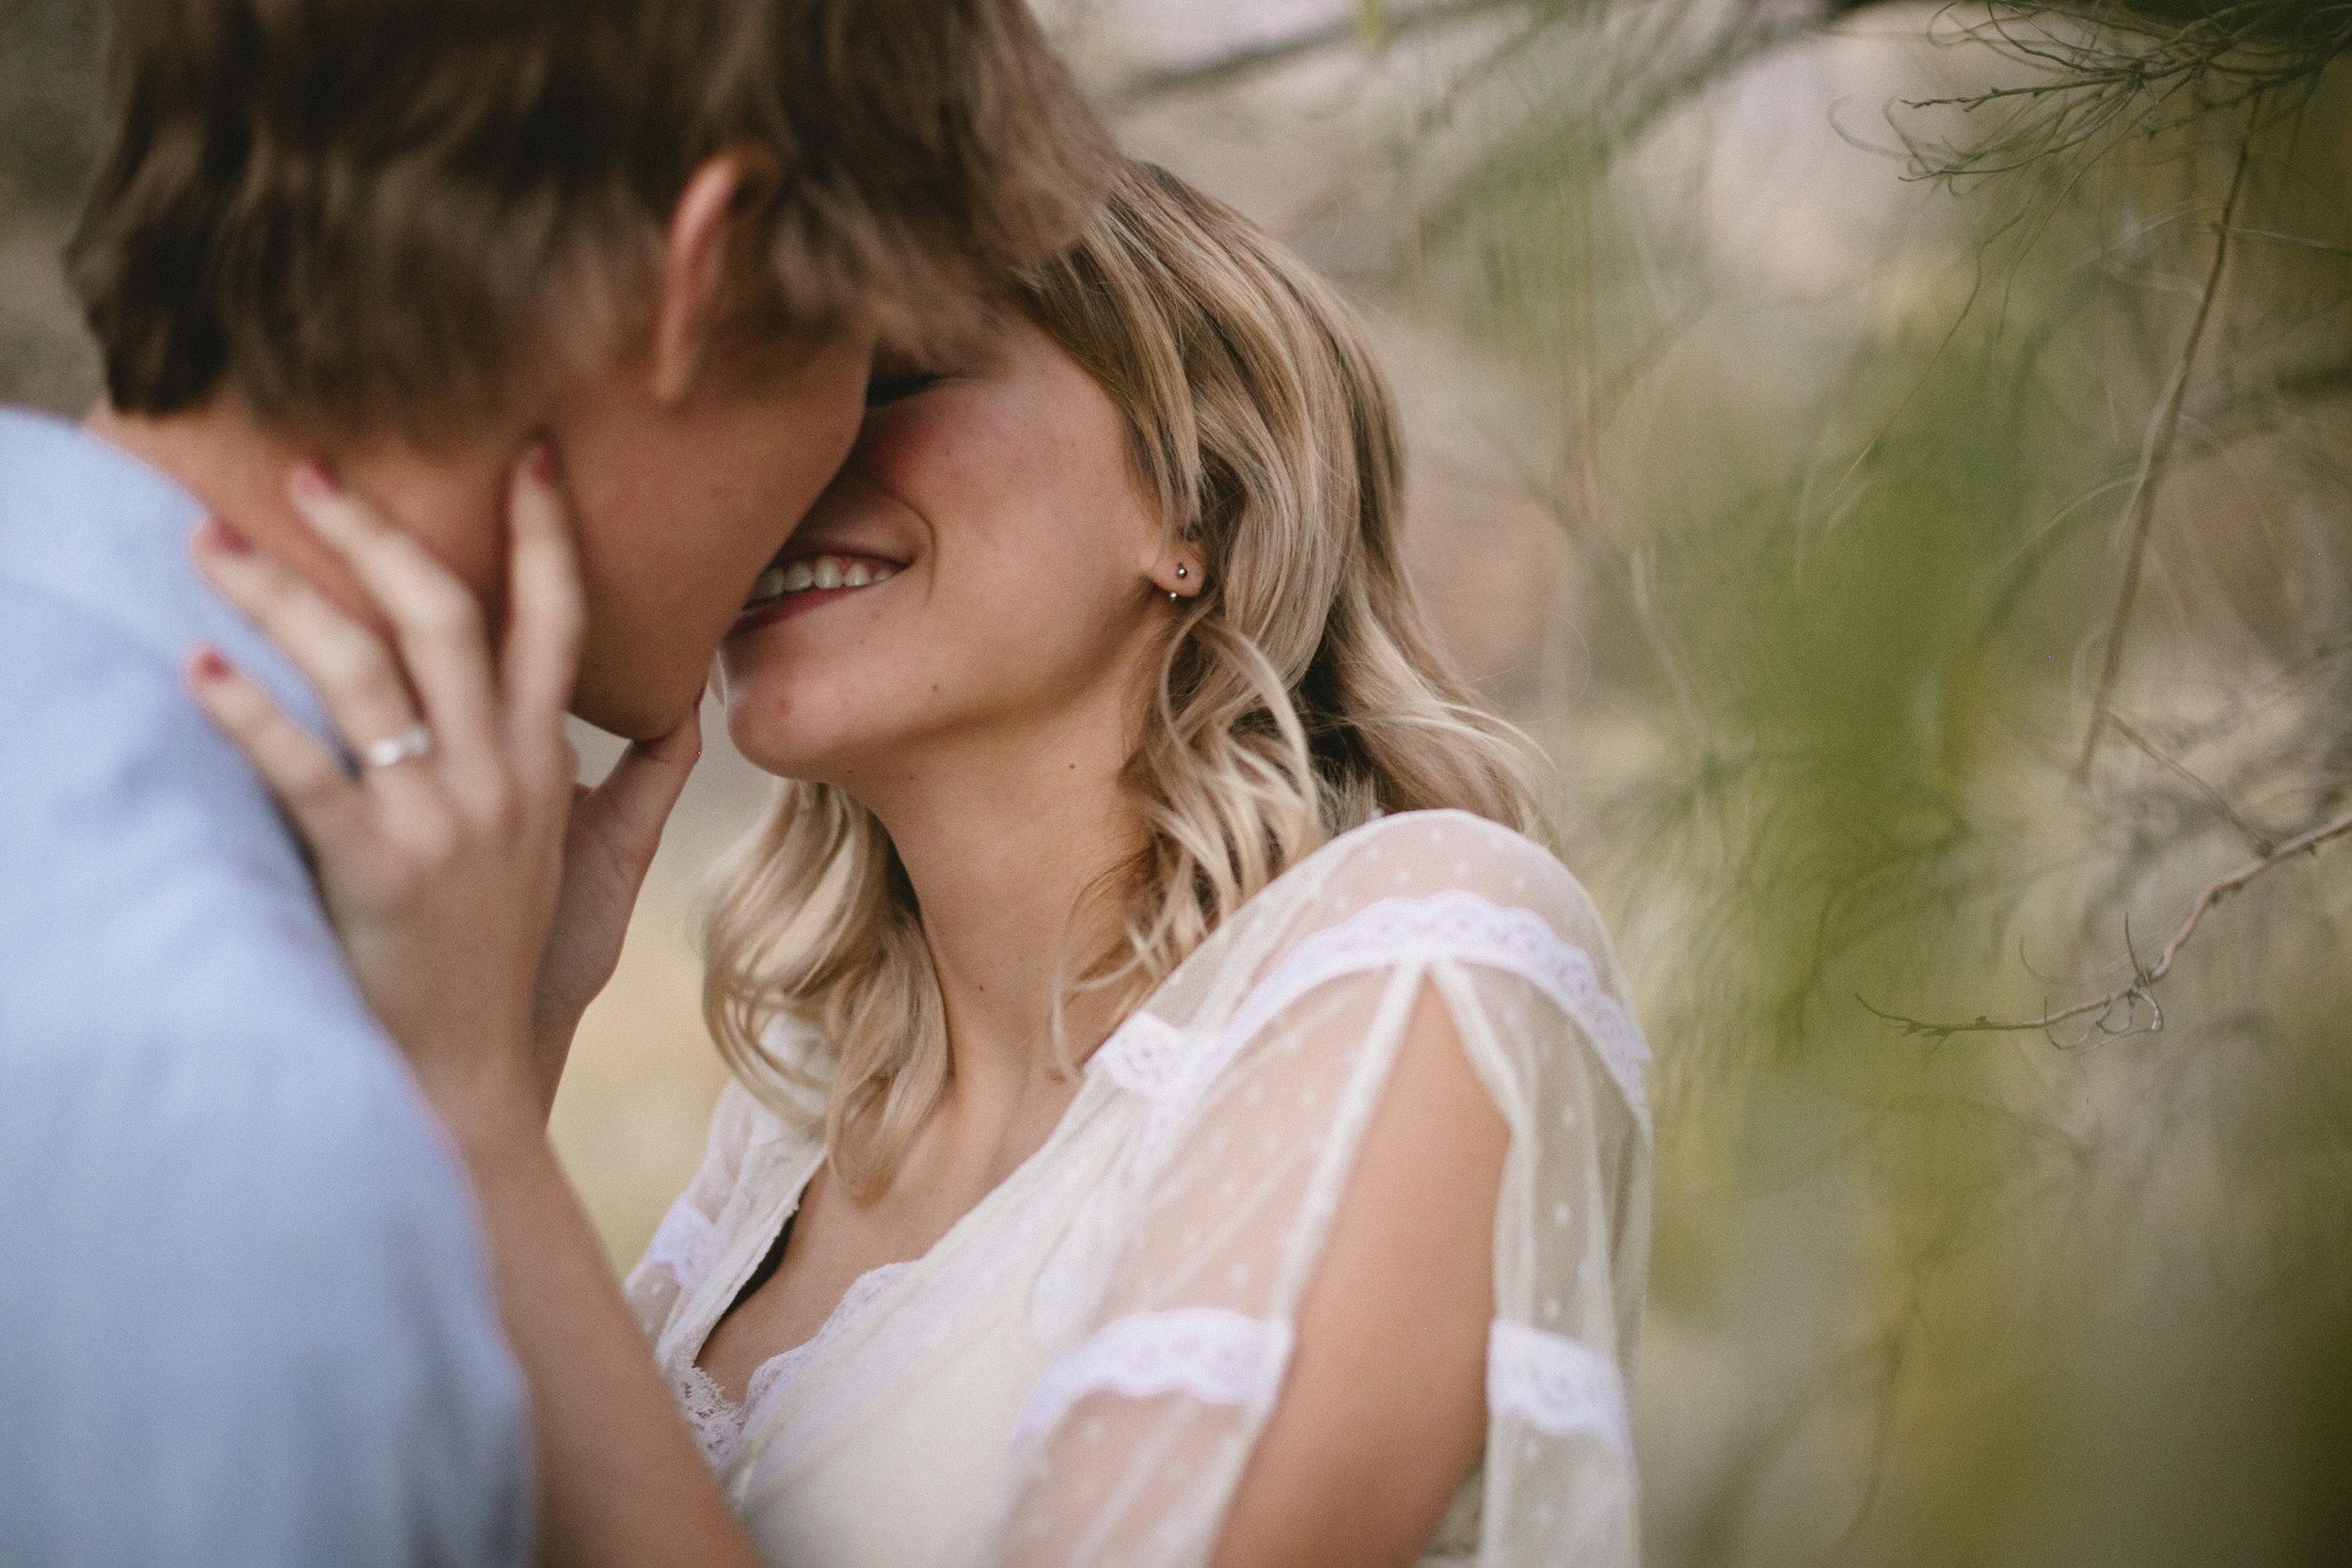 Utah Wedding Photographer Photographers Elopement Travel Destination Couple Romantic Bohemian Lifestyle Candid Creative Traveling Salt Lake Photography